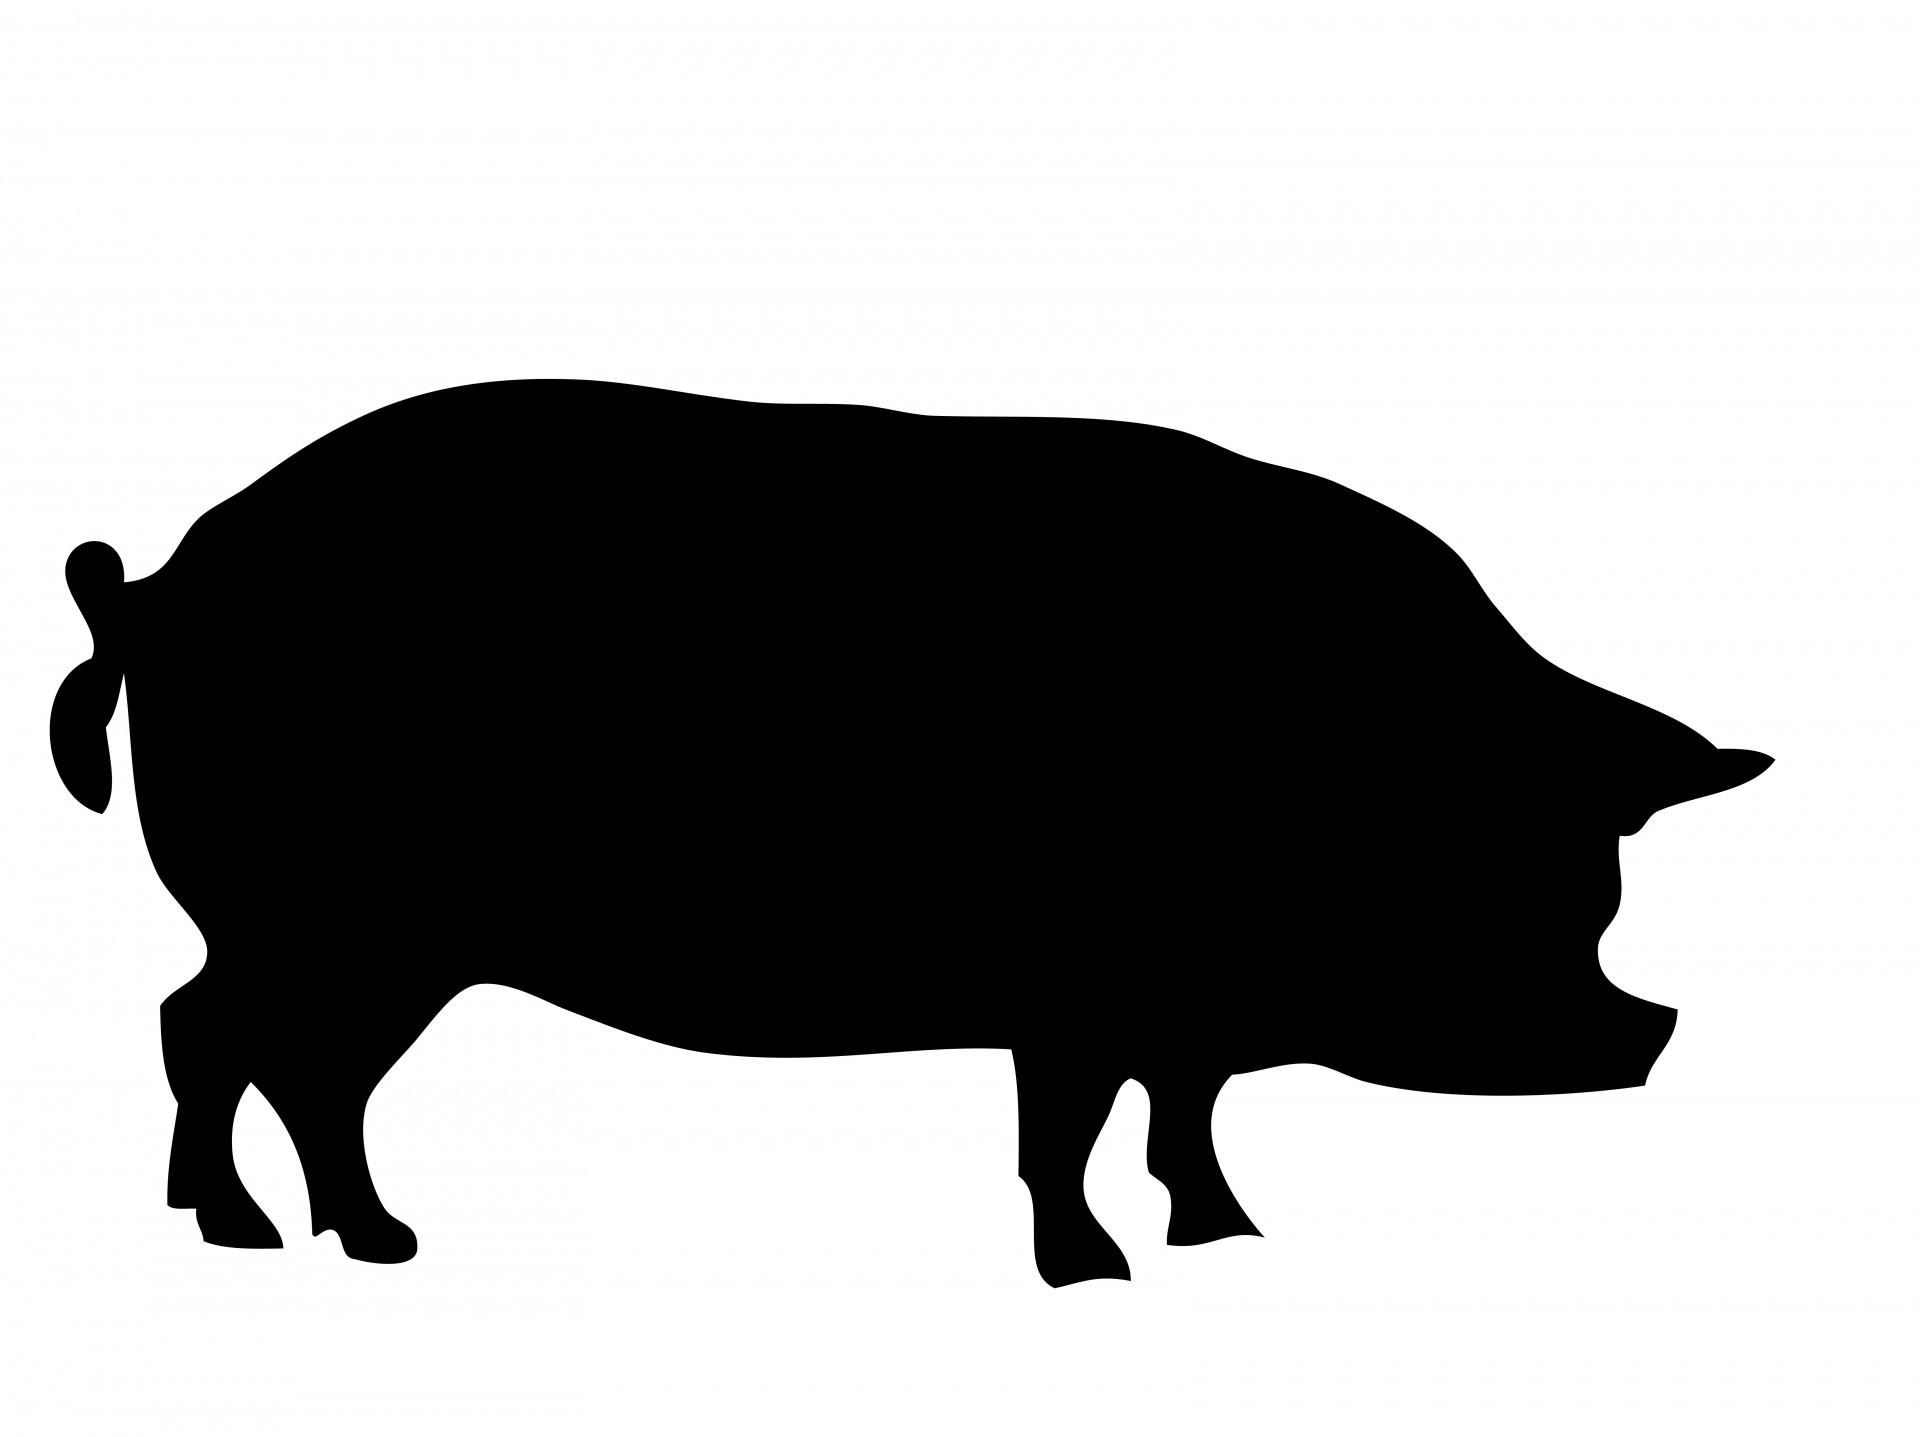 1920x1437 Pig Silhouette Free Stock Photo